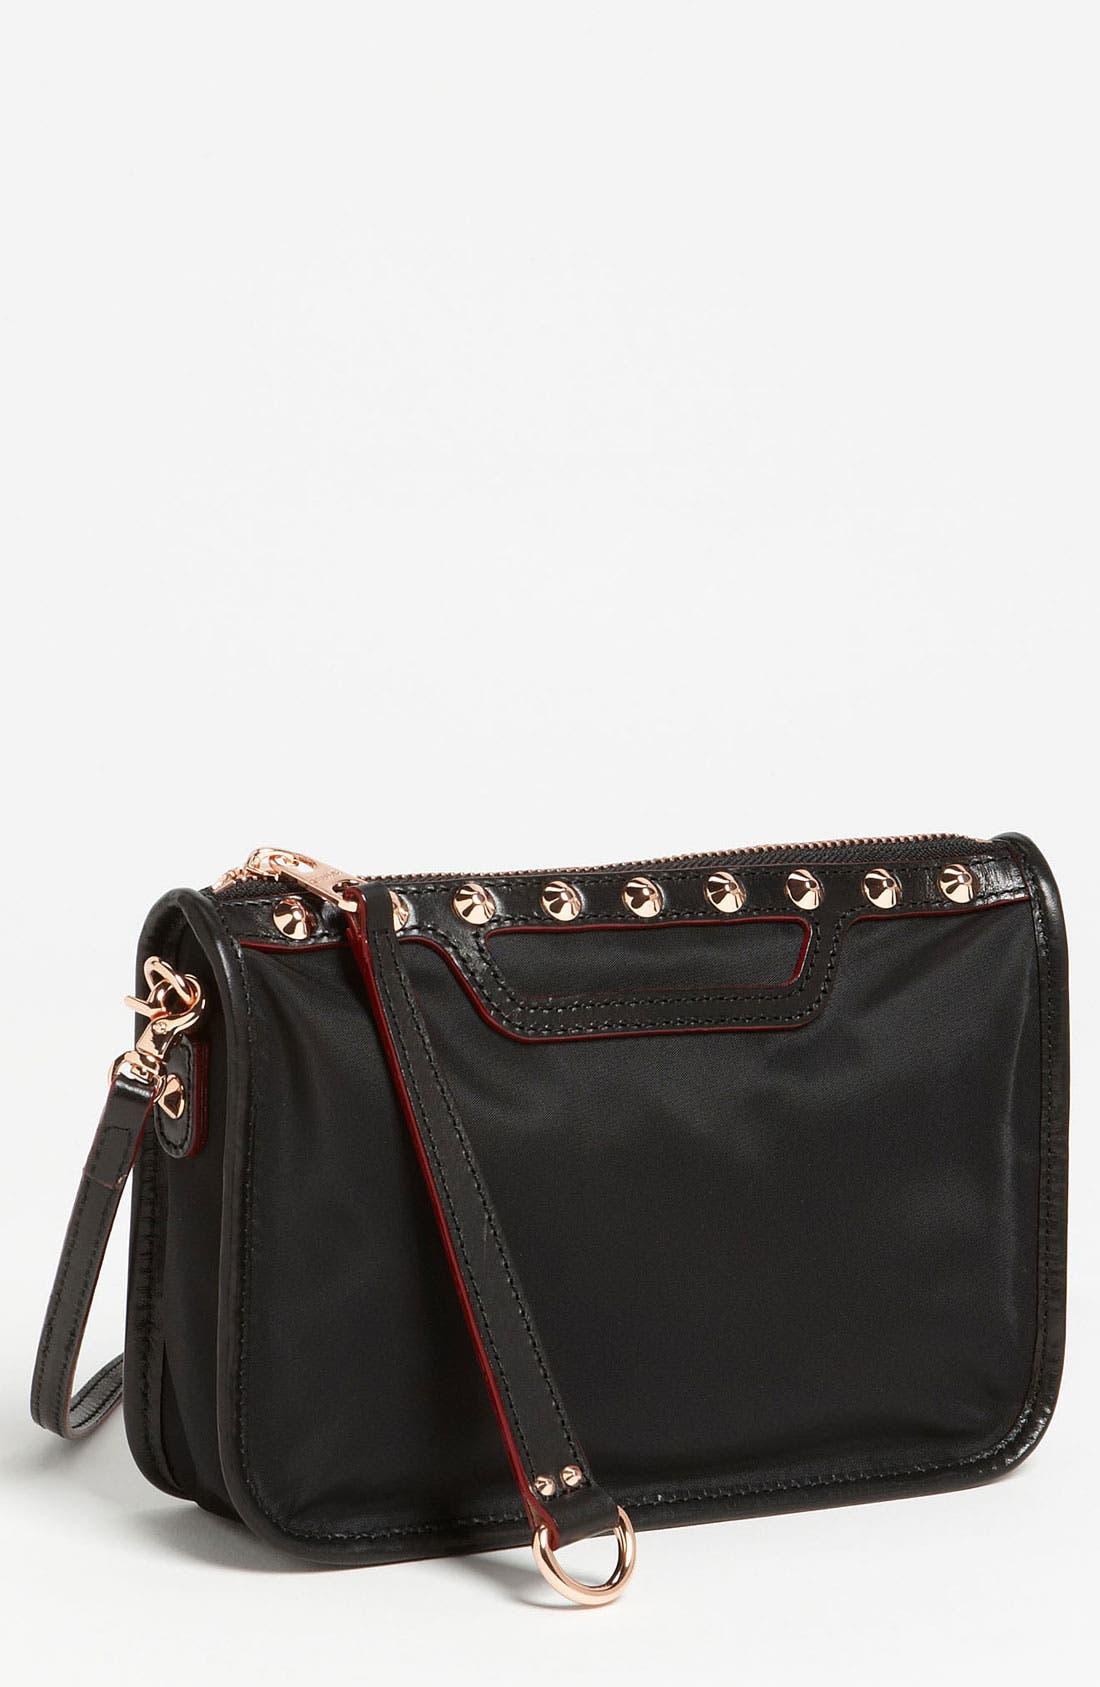 Alternate Image 1 Selected - MZ Wallace 'Daria' Crossbody Bag